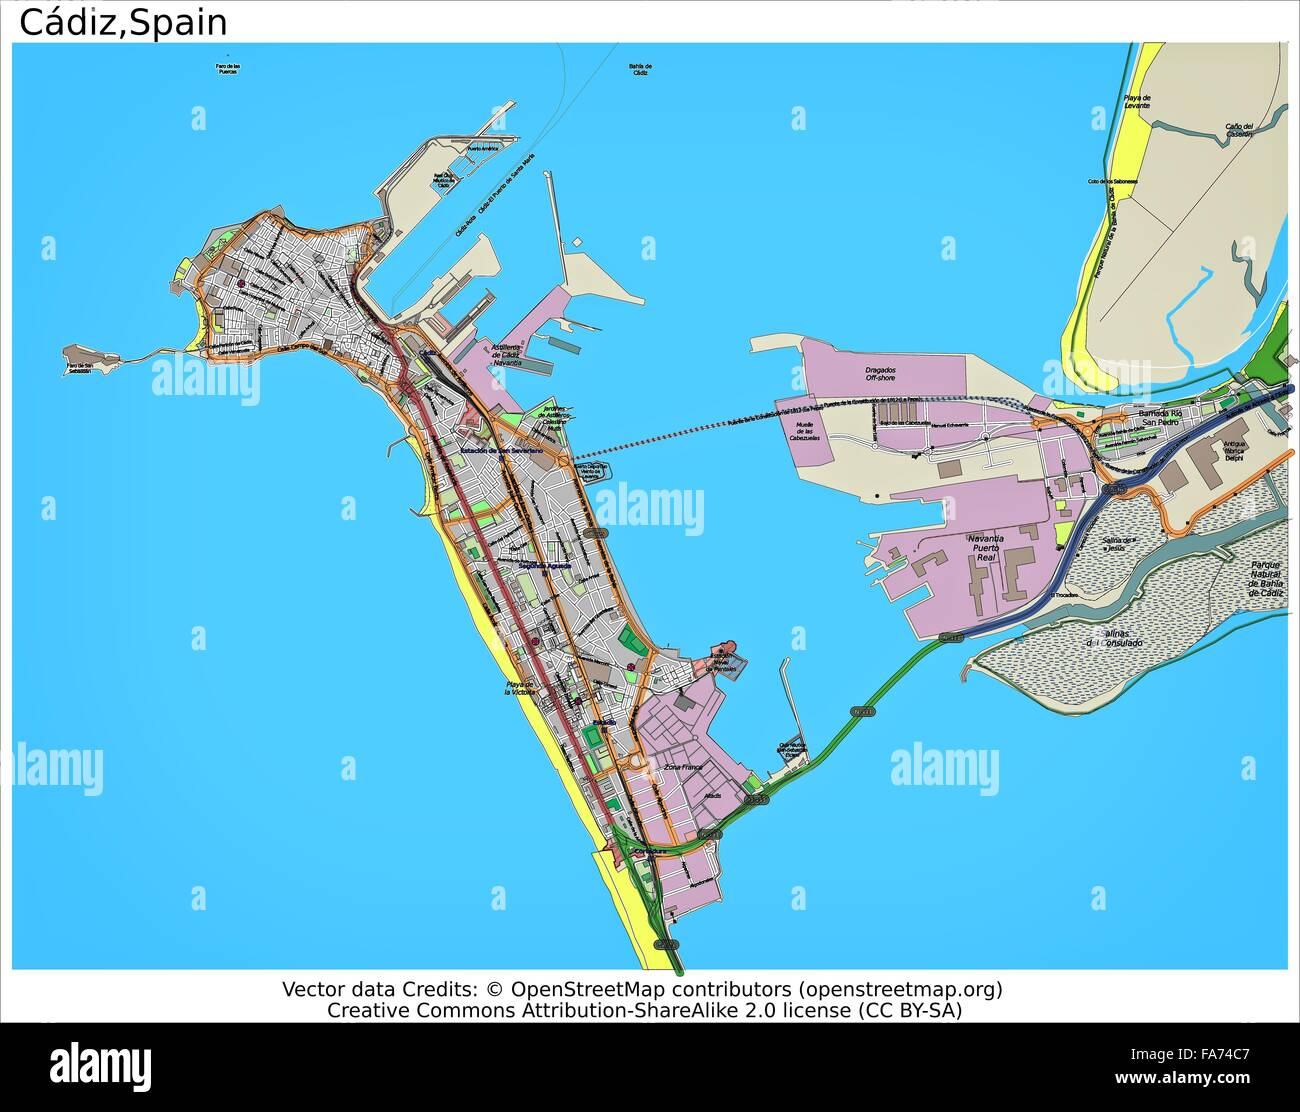 Cadiz Spain Location Map